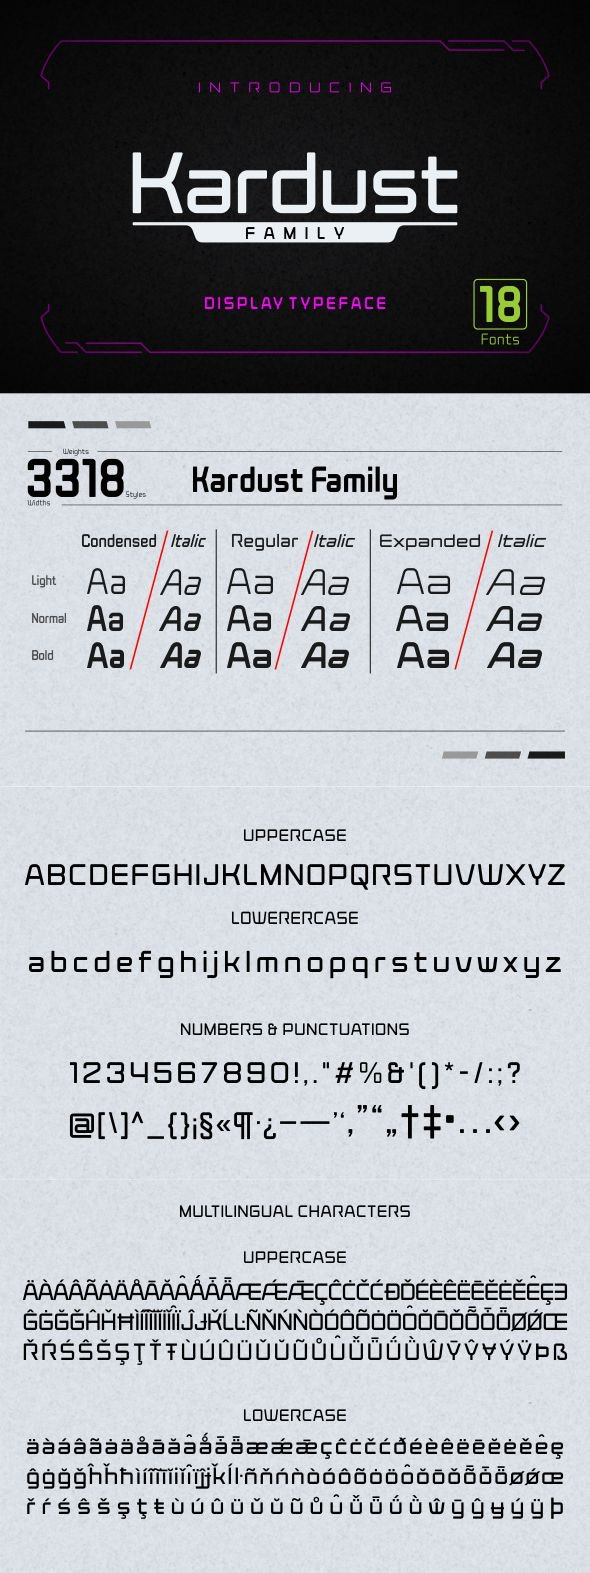 Kardust Family - Sans-Serif Fonts